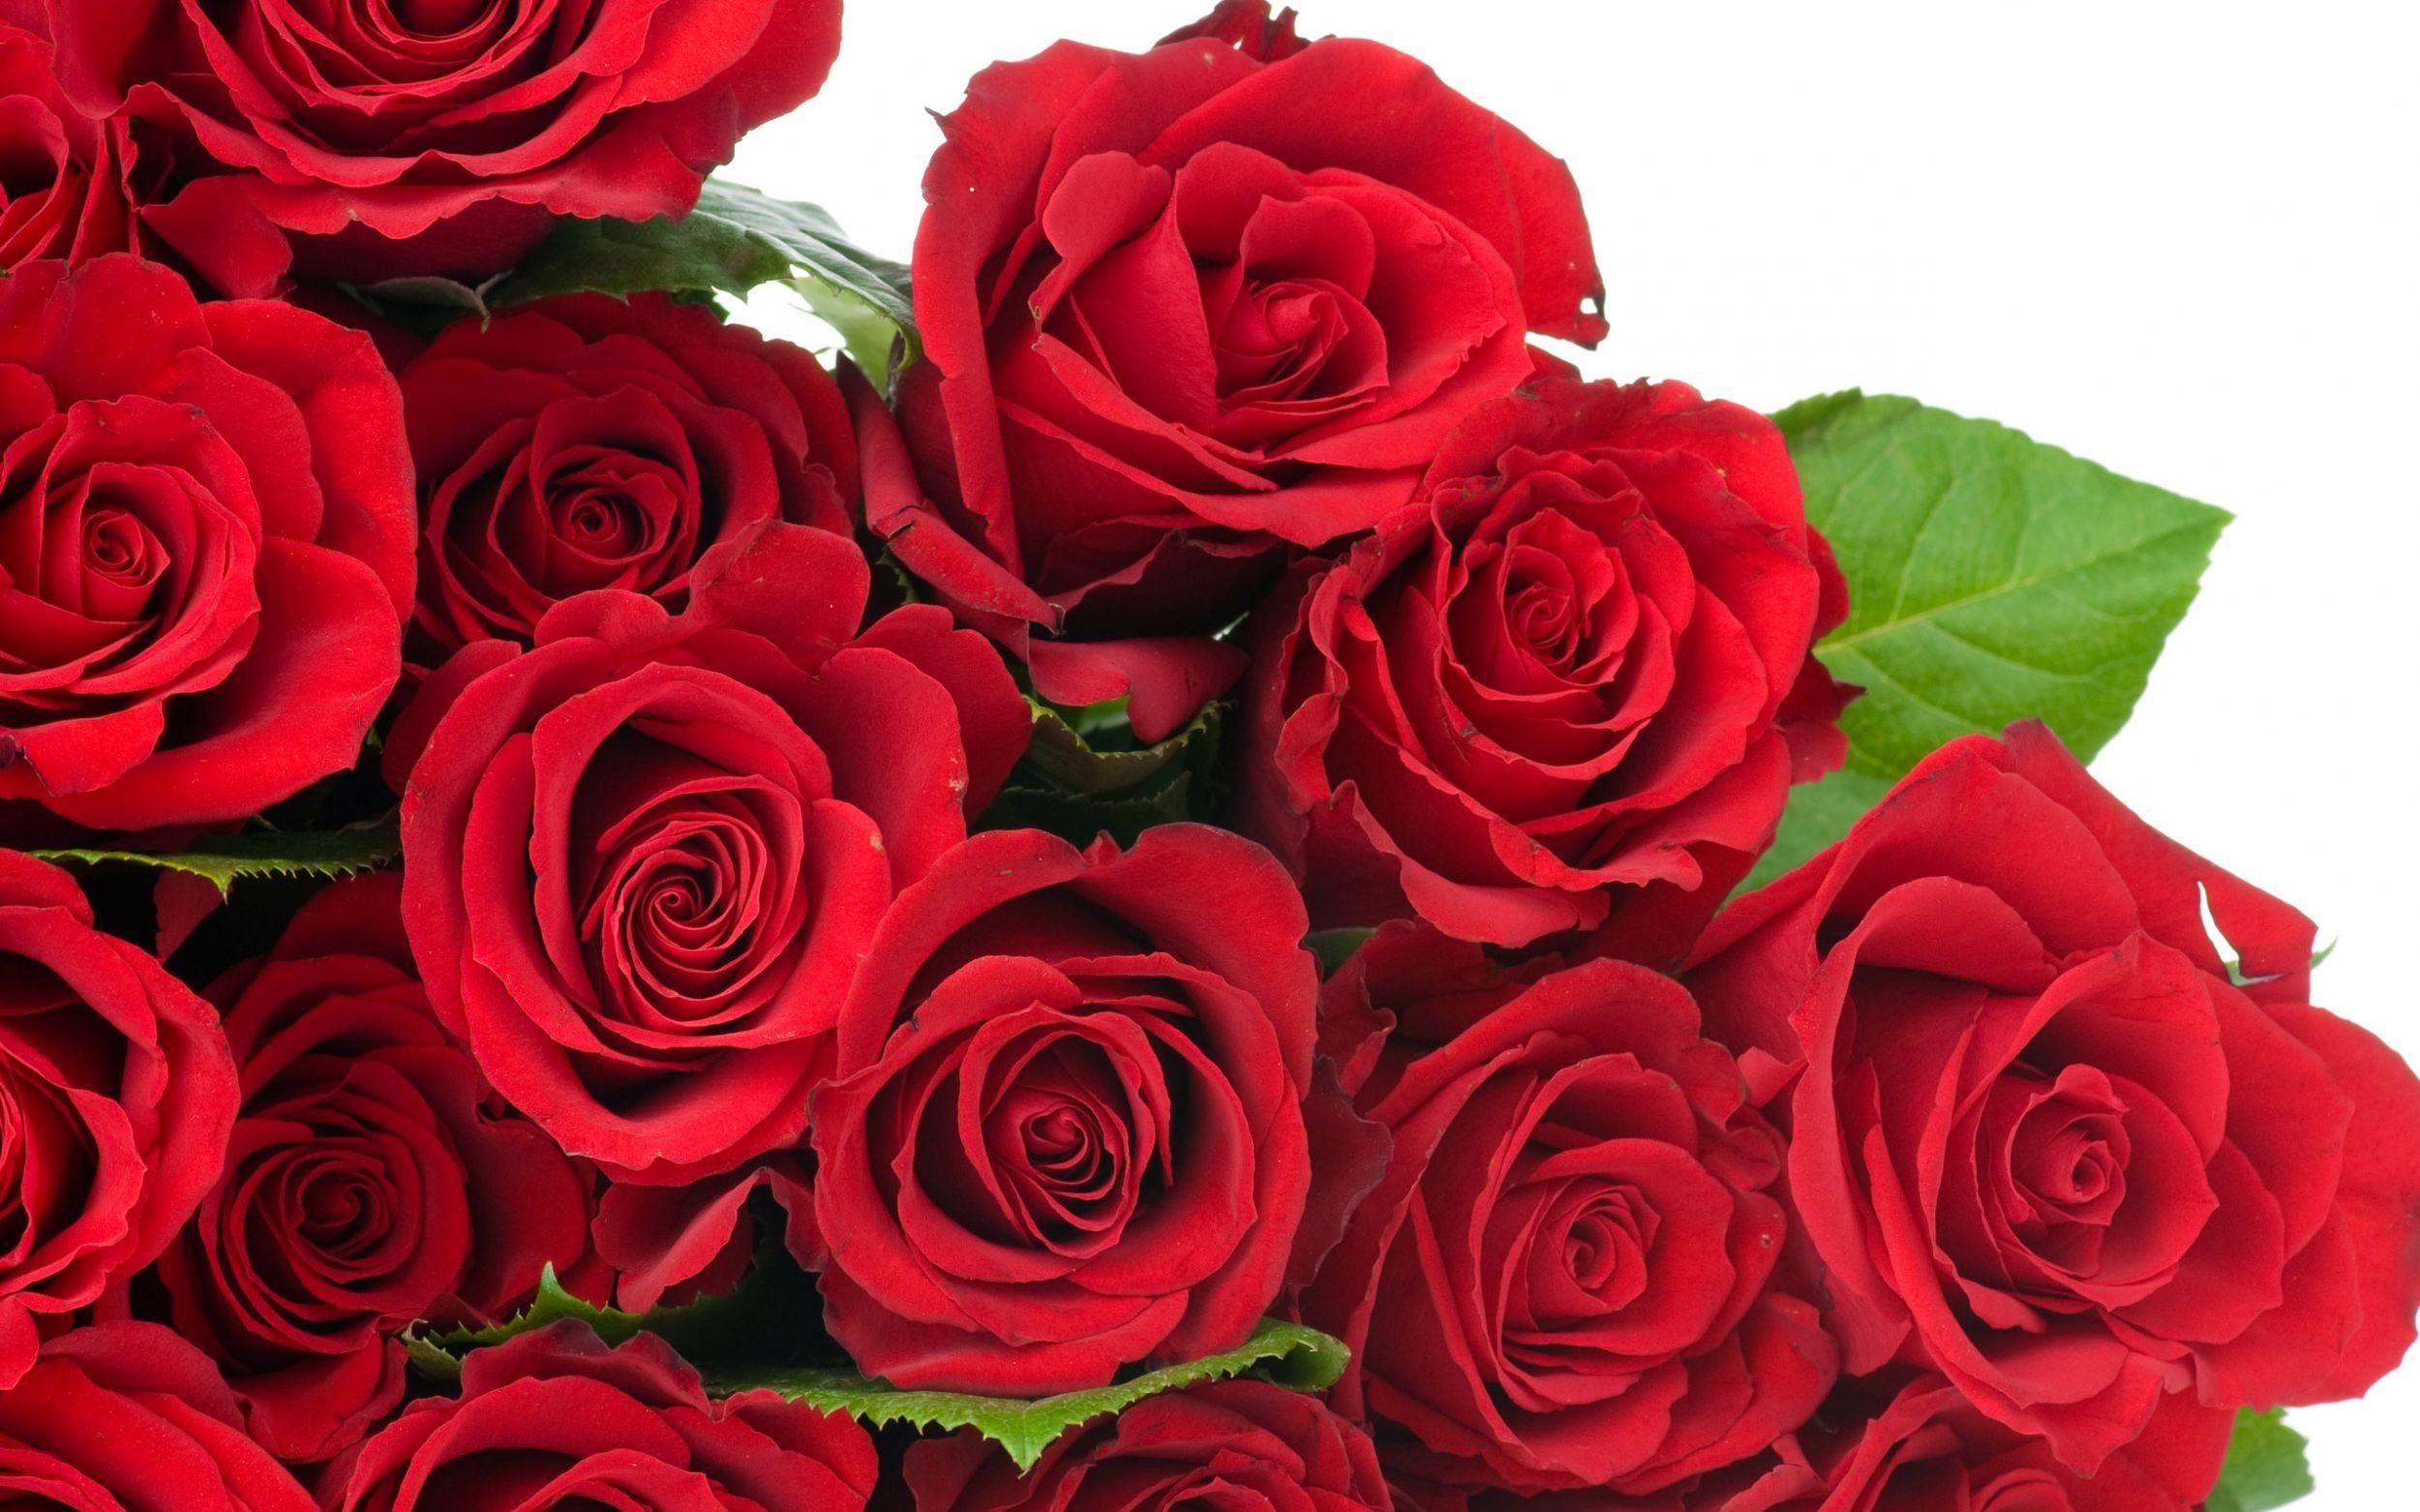 1920x1080 Wallpaper Bouquet Composition Beautiful Roses Flowers